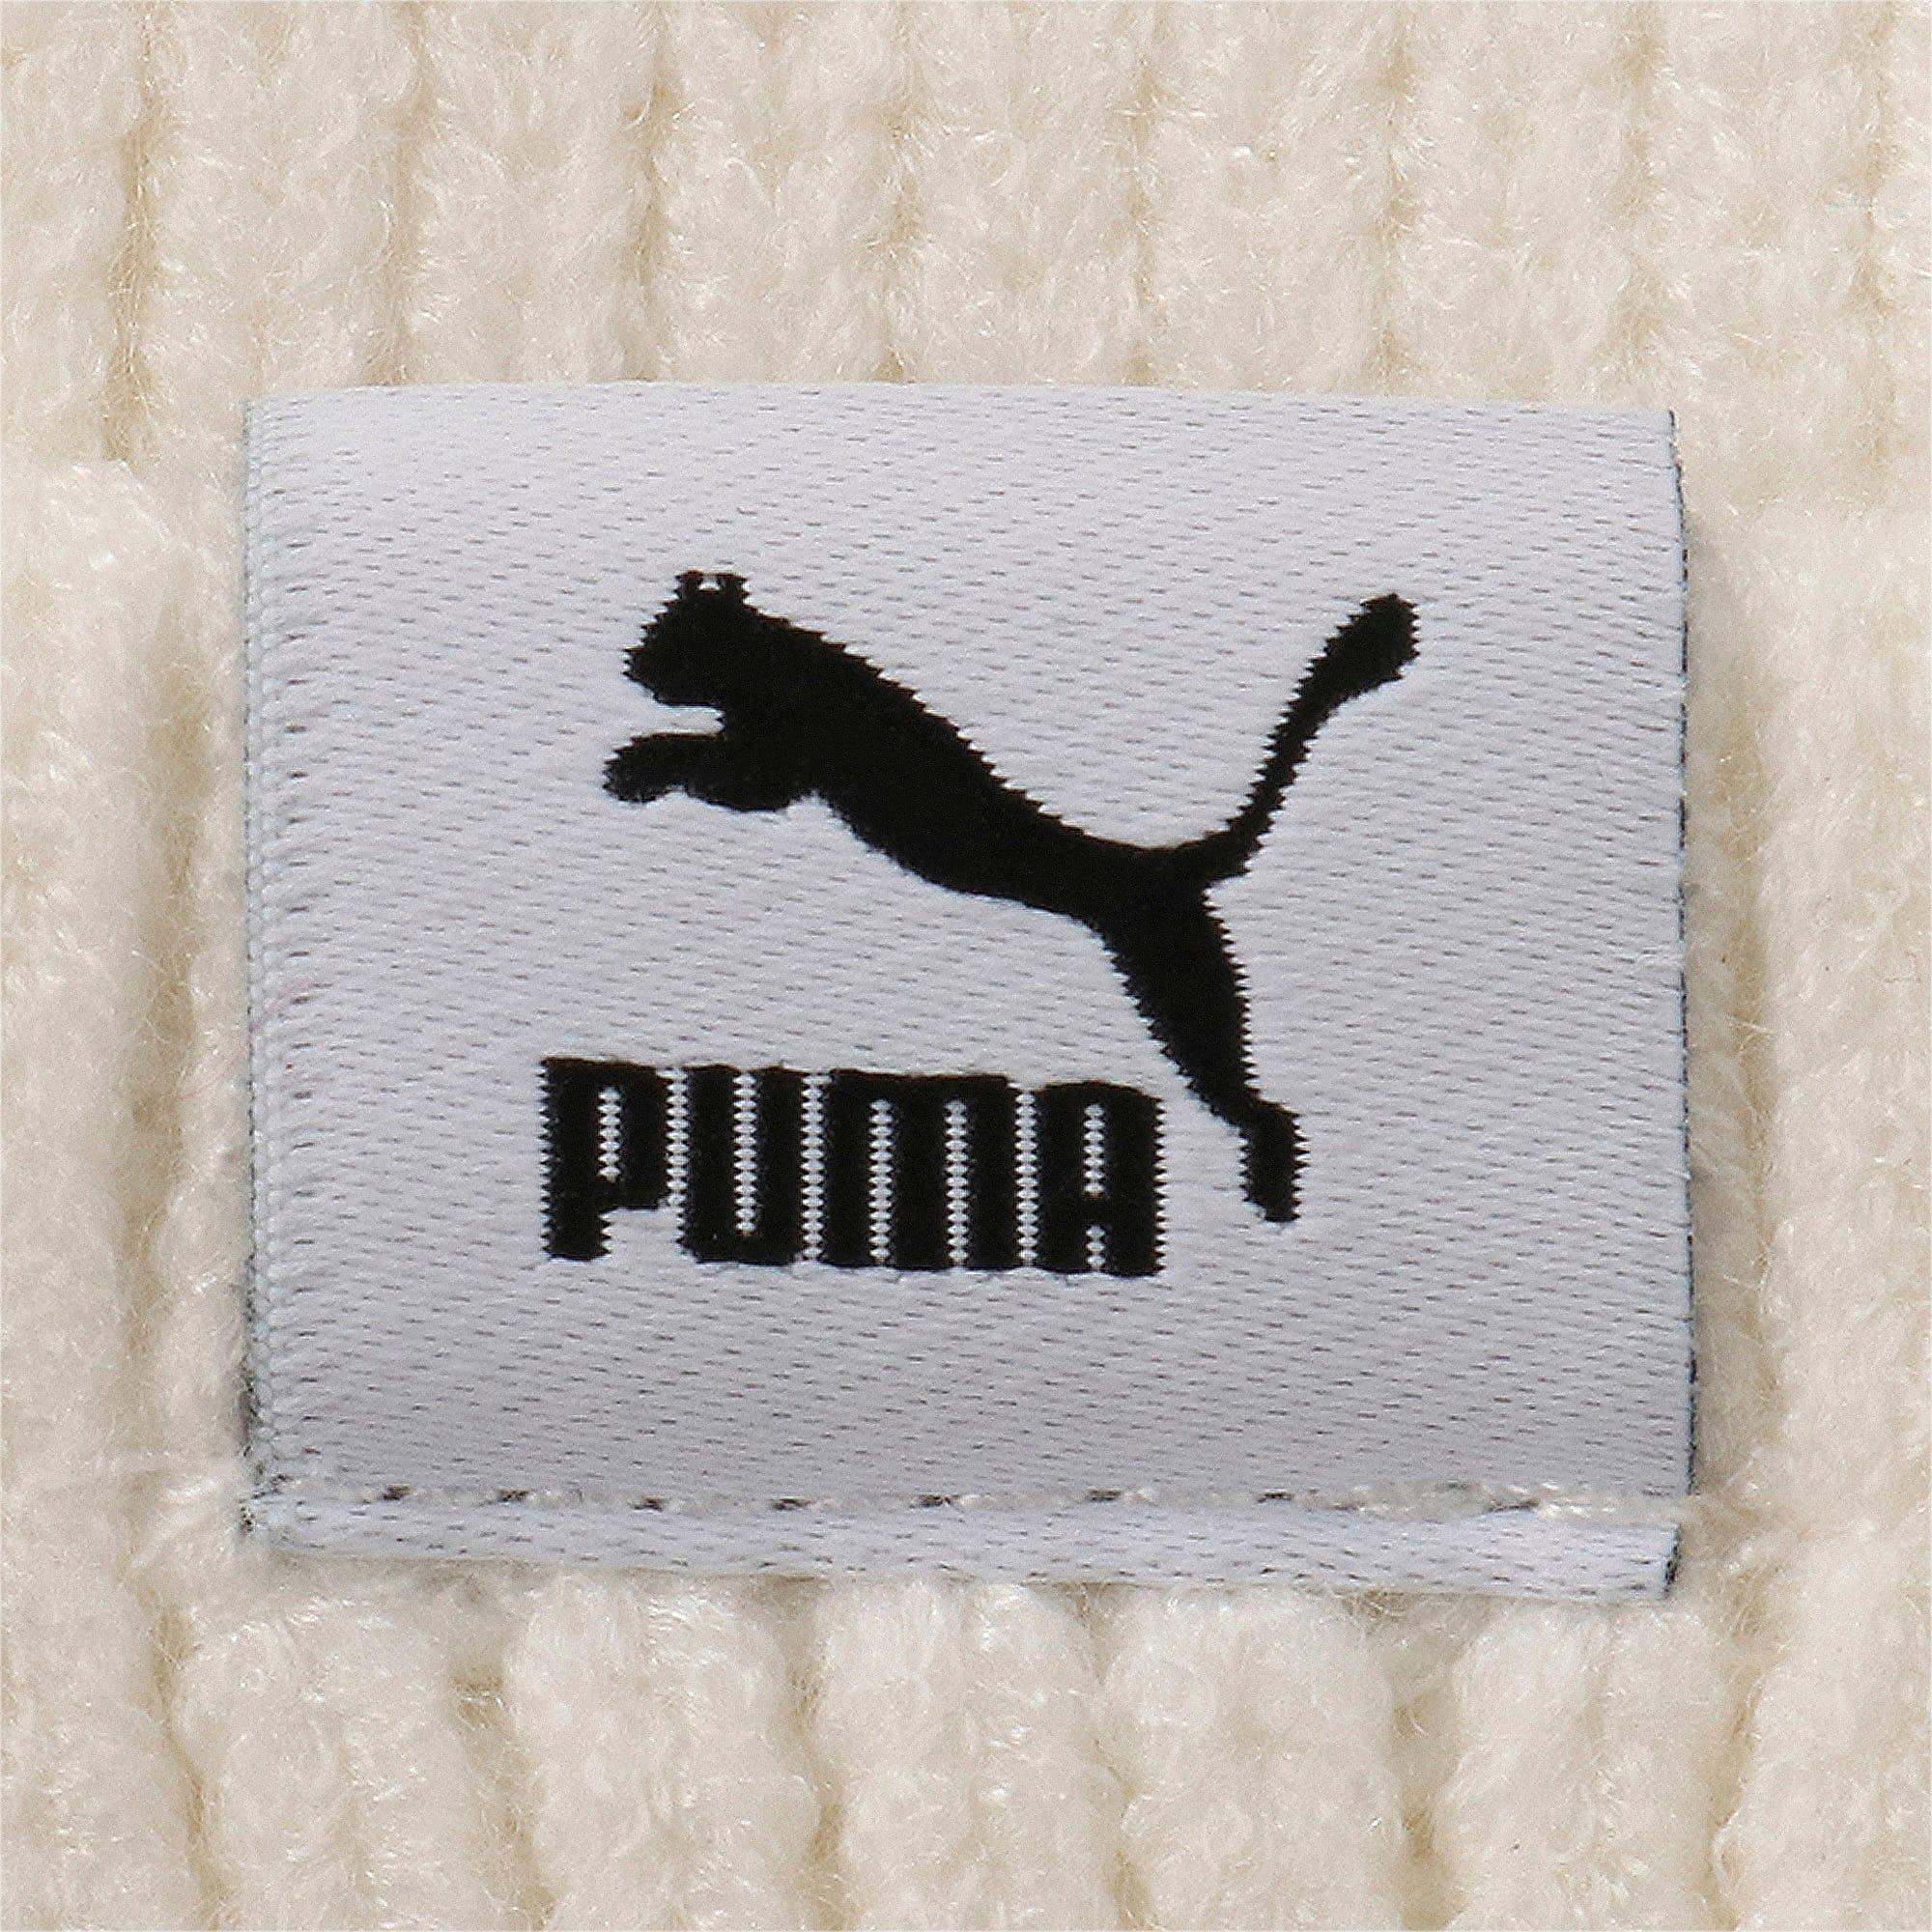 Thumbnail 4 of ハイブリッド フィット ウィメンズ トレンド ビーニー, Puma White, medium-JPN